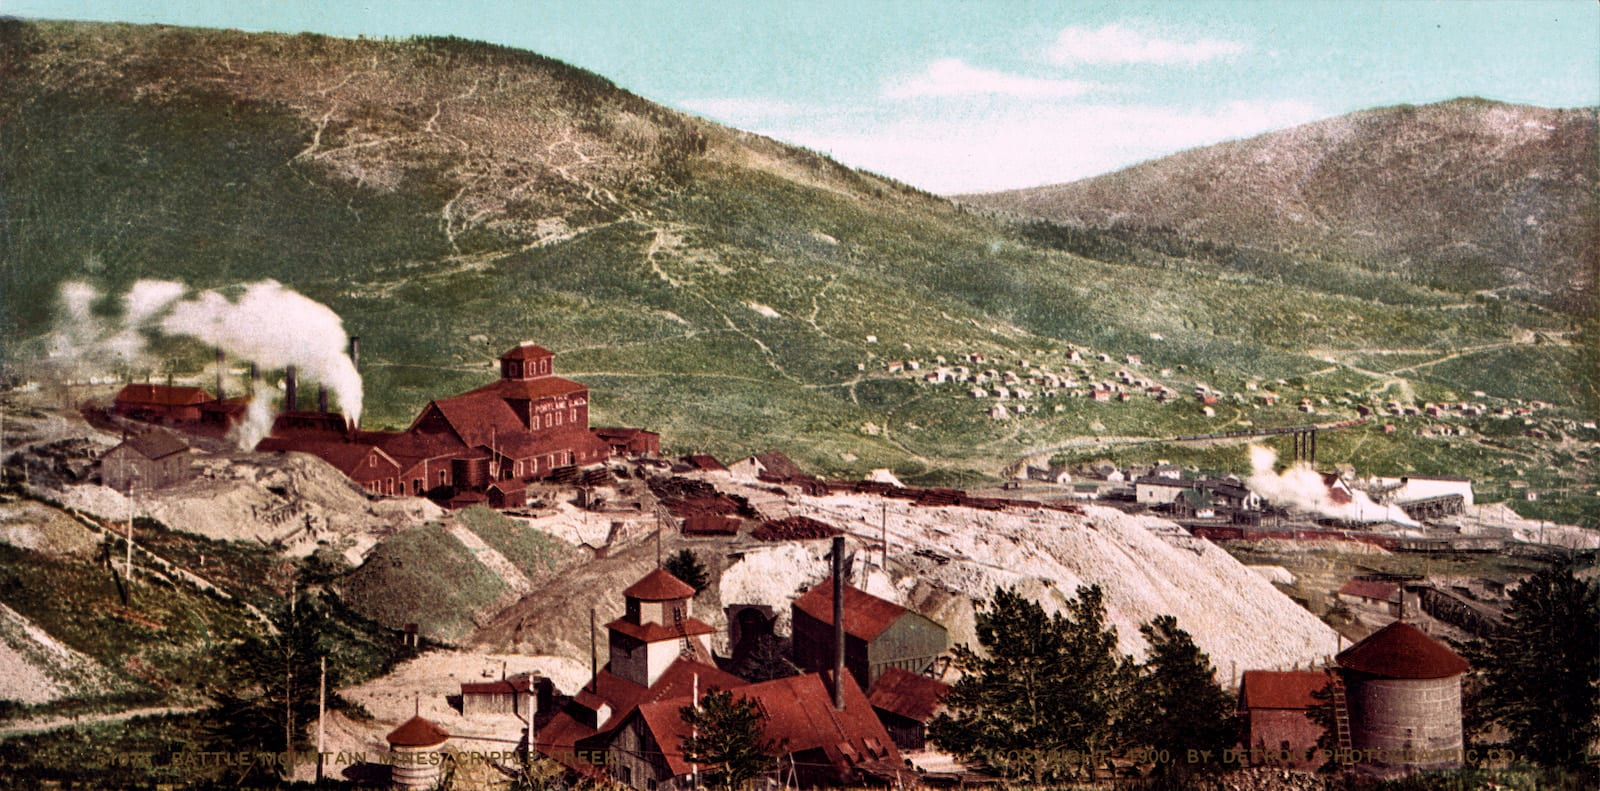 Battle Mountain Mines Cripple Creek CO Circa 1900